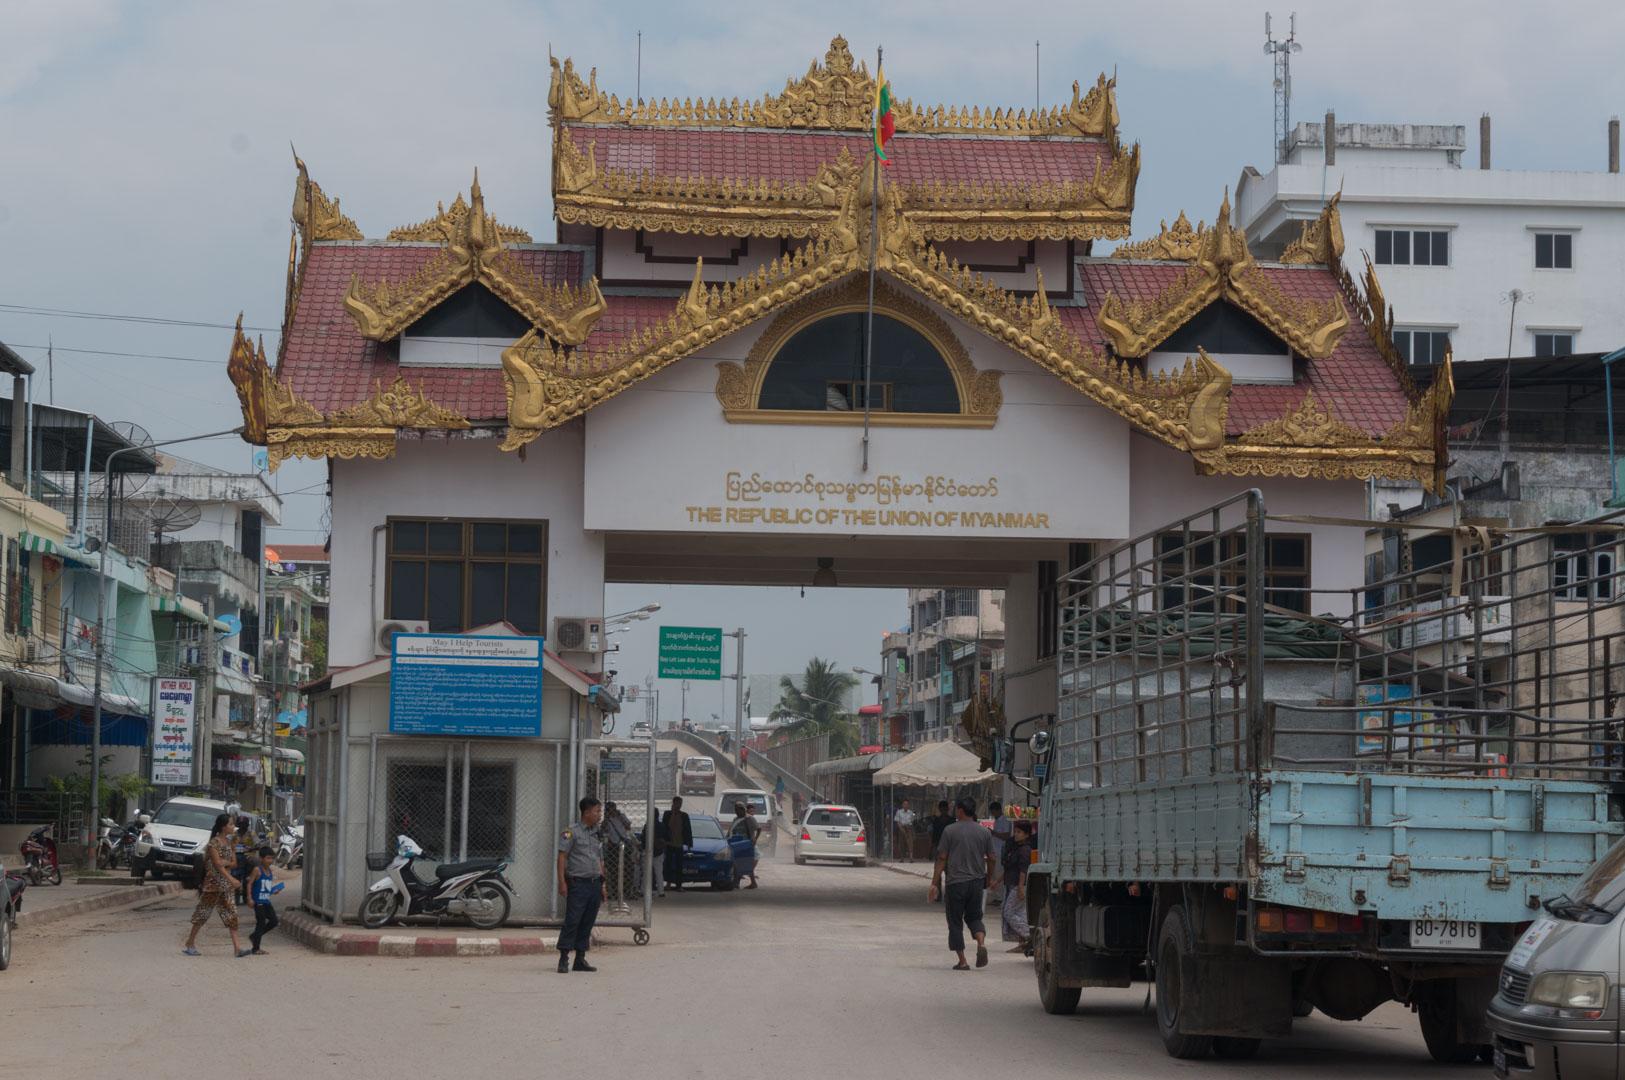 Grenze Myawaddy Mae Sot Myanmar Thailand